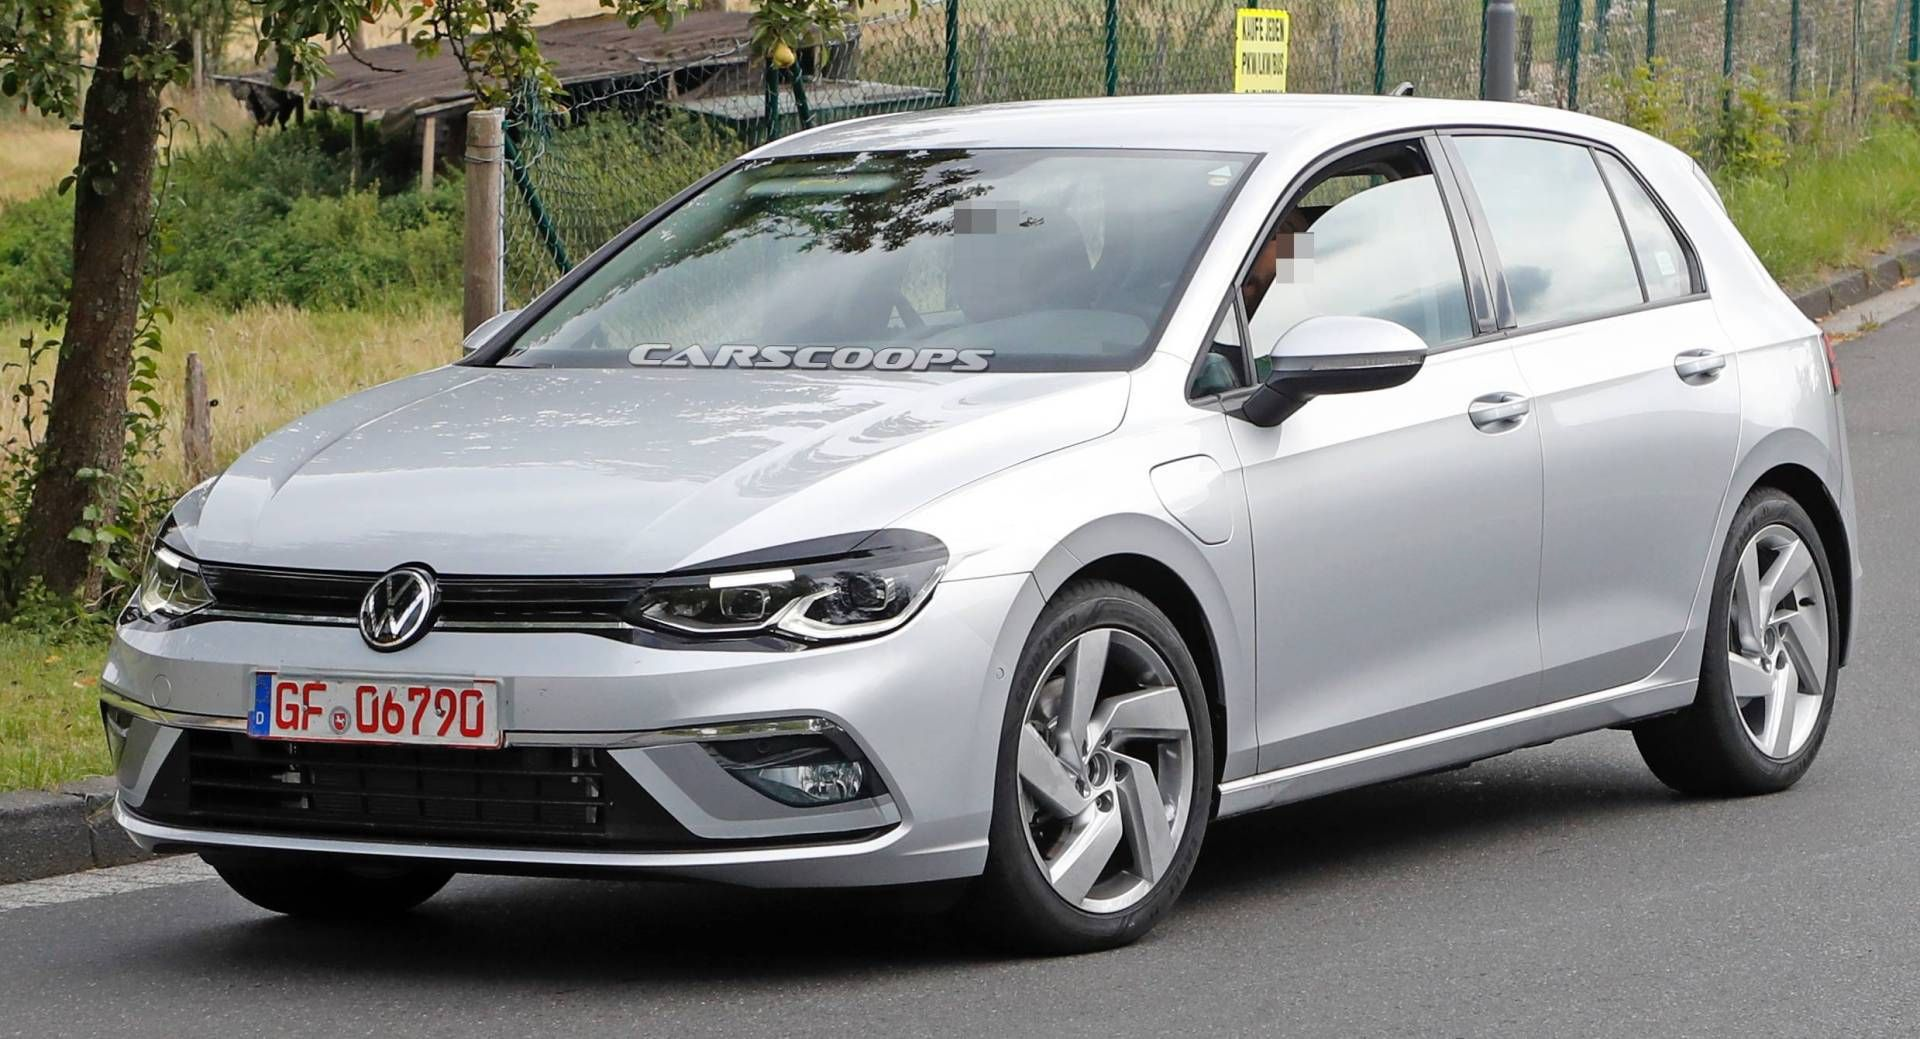 2020 Vw Golf Drops Almost All Camo In Gte Plug In Hybrid Guise Volkswagen Golf R Volkswagen Volkswagen Golf